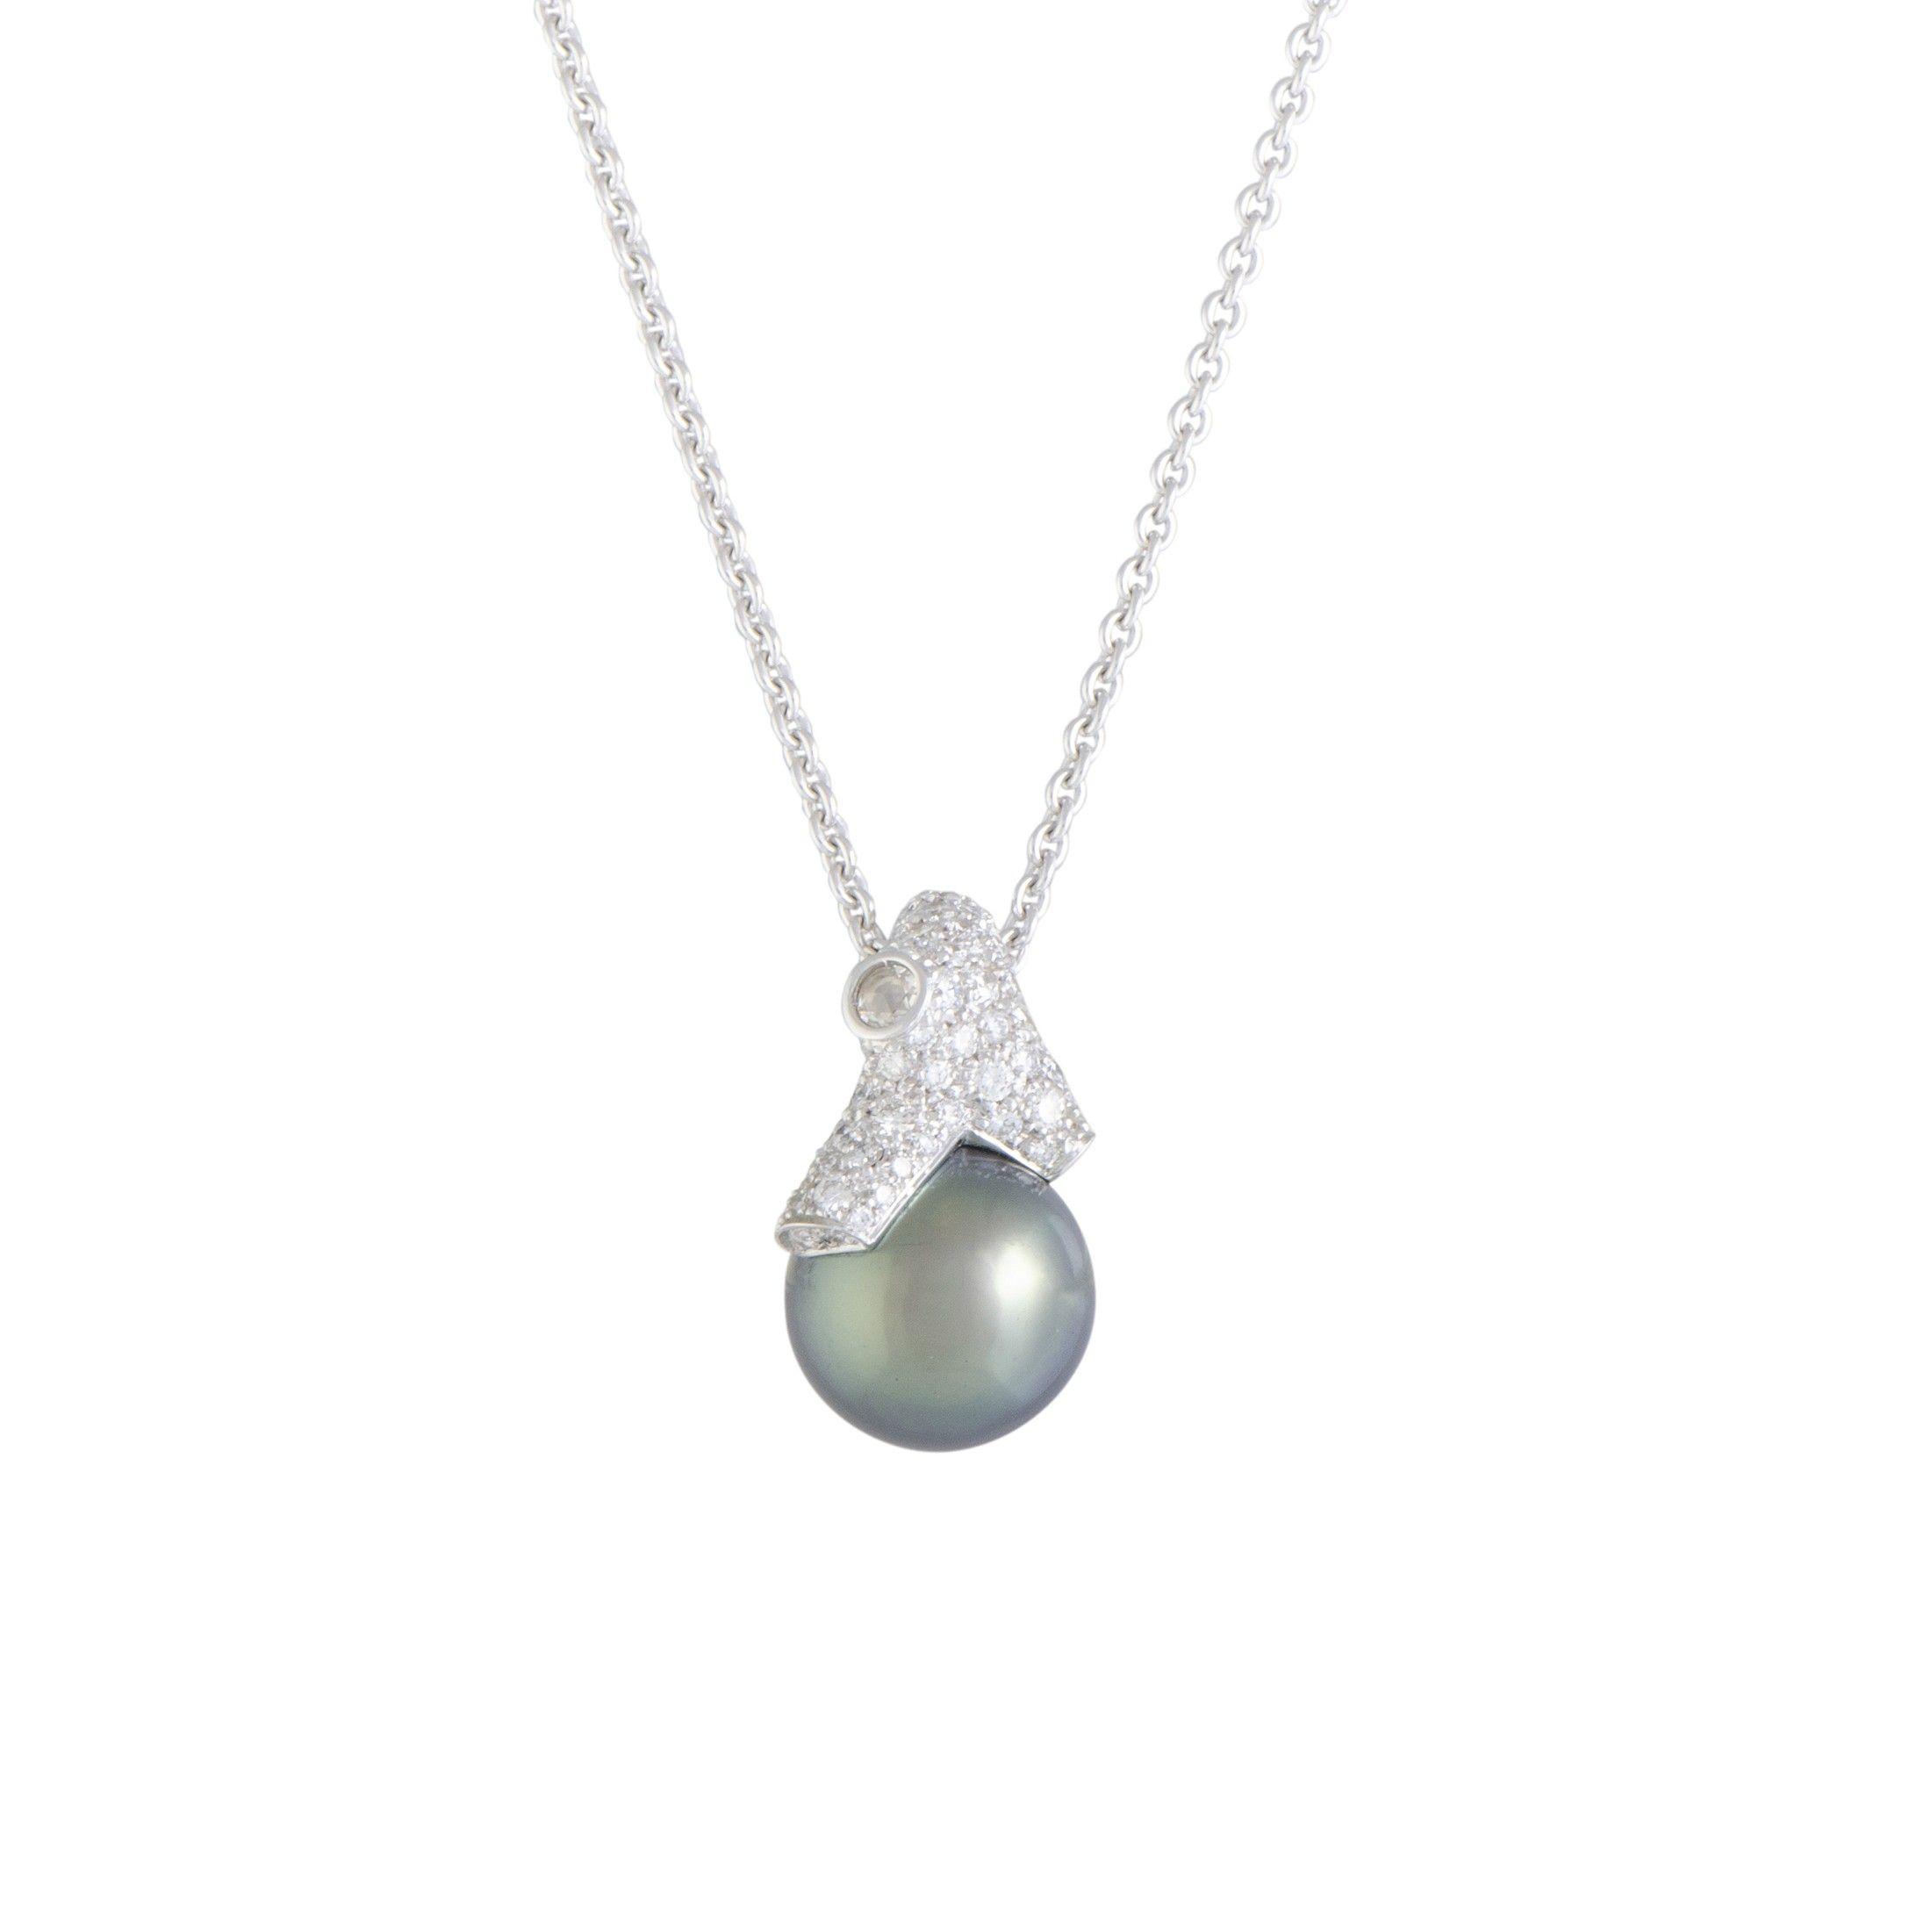 cfff94666888b Mikimoto 18K White Gold Diamond and 12.0-13.0mm Black Pearl Pendant Necklace